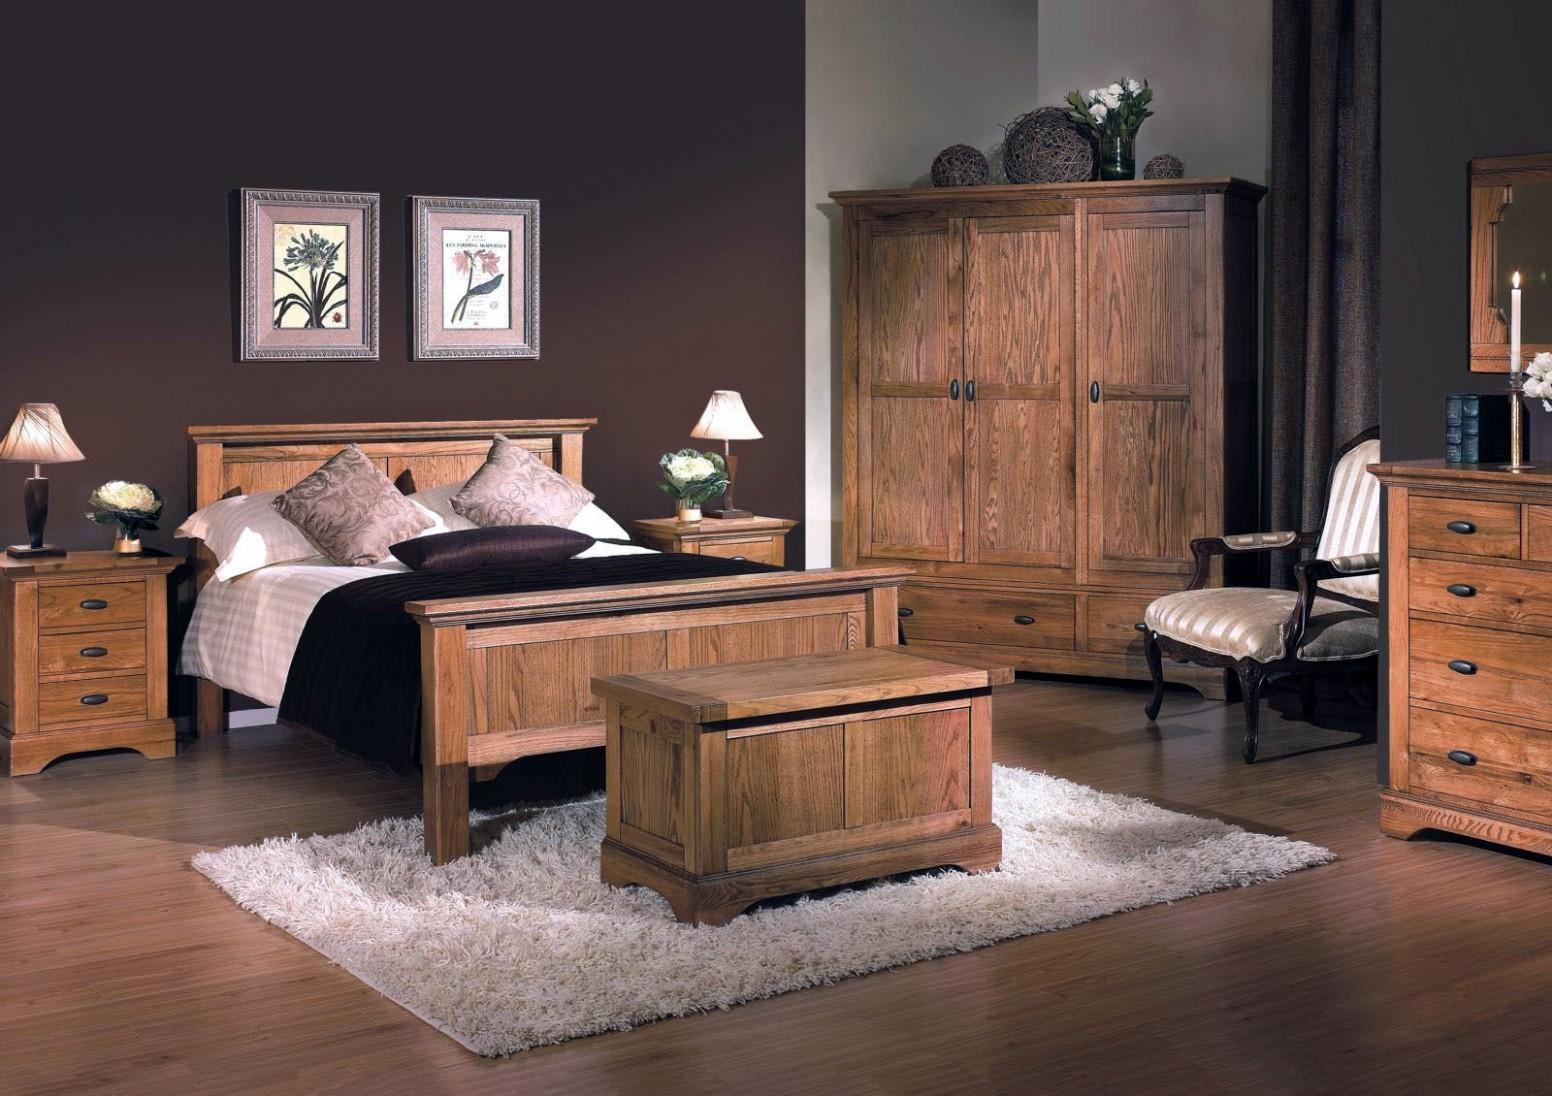 Master Bedroom Decorating Ideas  Oak bedroom furniture, Wood  - Bedroom Ideas Oak Furniture